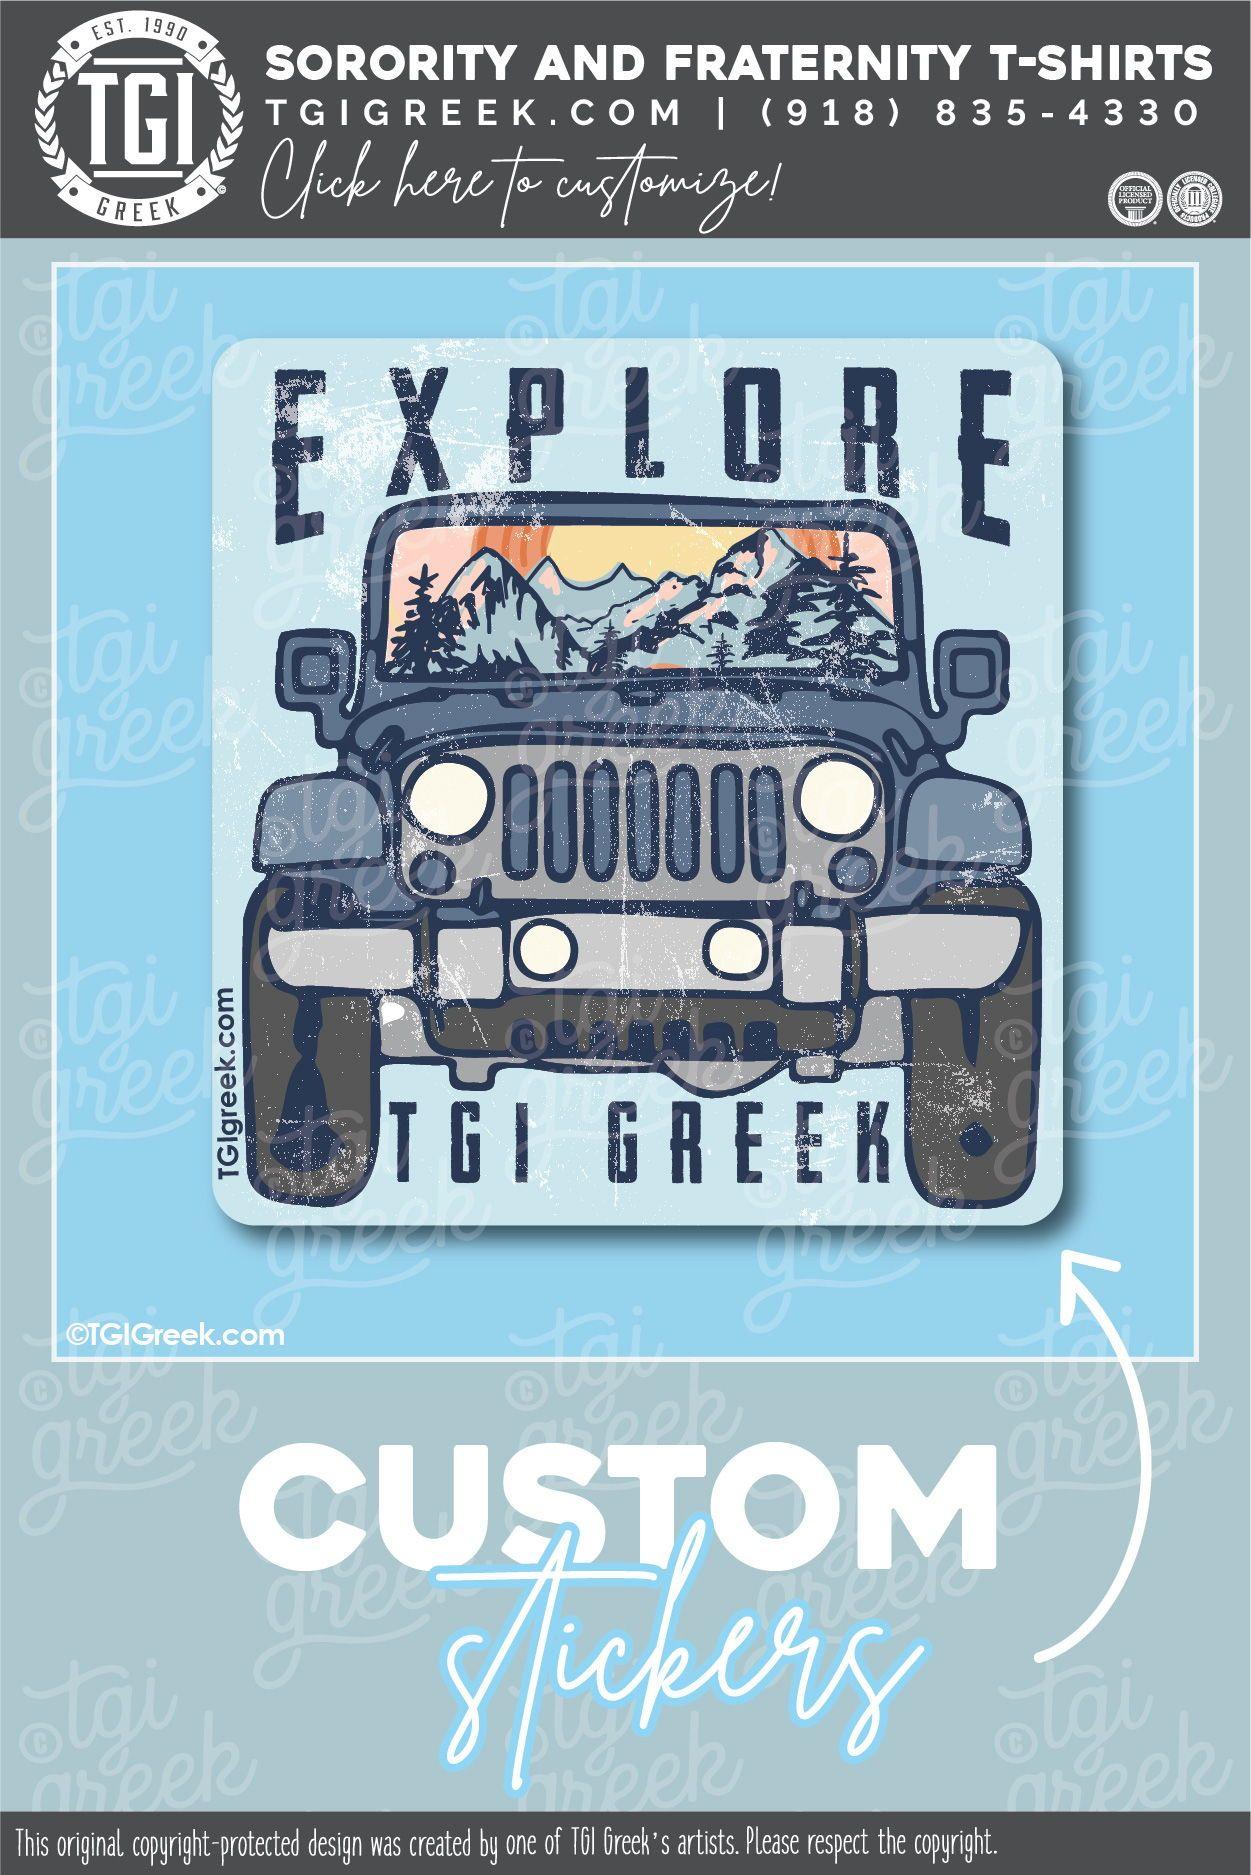 Tgi Stickers Explore Stickers Design Library Tgi Greek Fraternity Shirt Design Sorority And Fraternity Fraternity Tshirts [ 1875 x 1251 Pixel ]